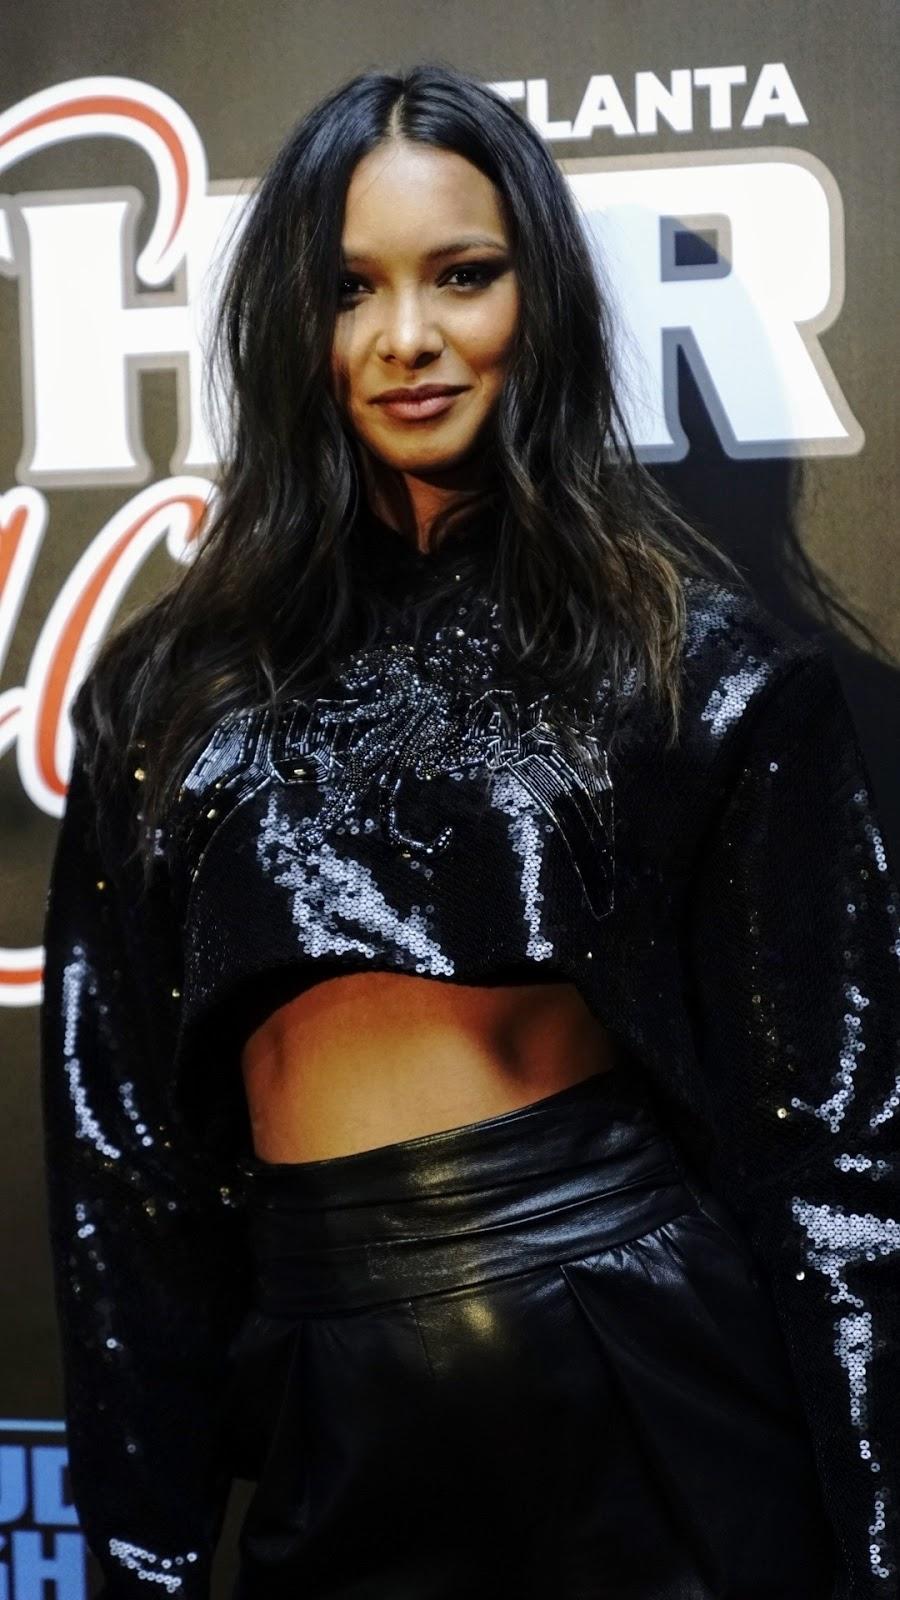 Lais Ribeiro - 16th annual Super Bowl Leather & Laces Party in Atlanta. GA February 1, 2019